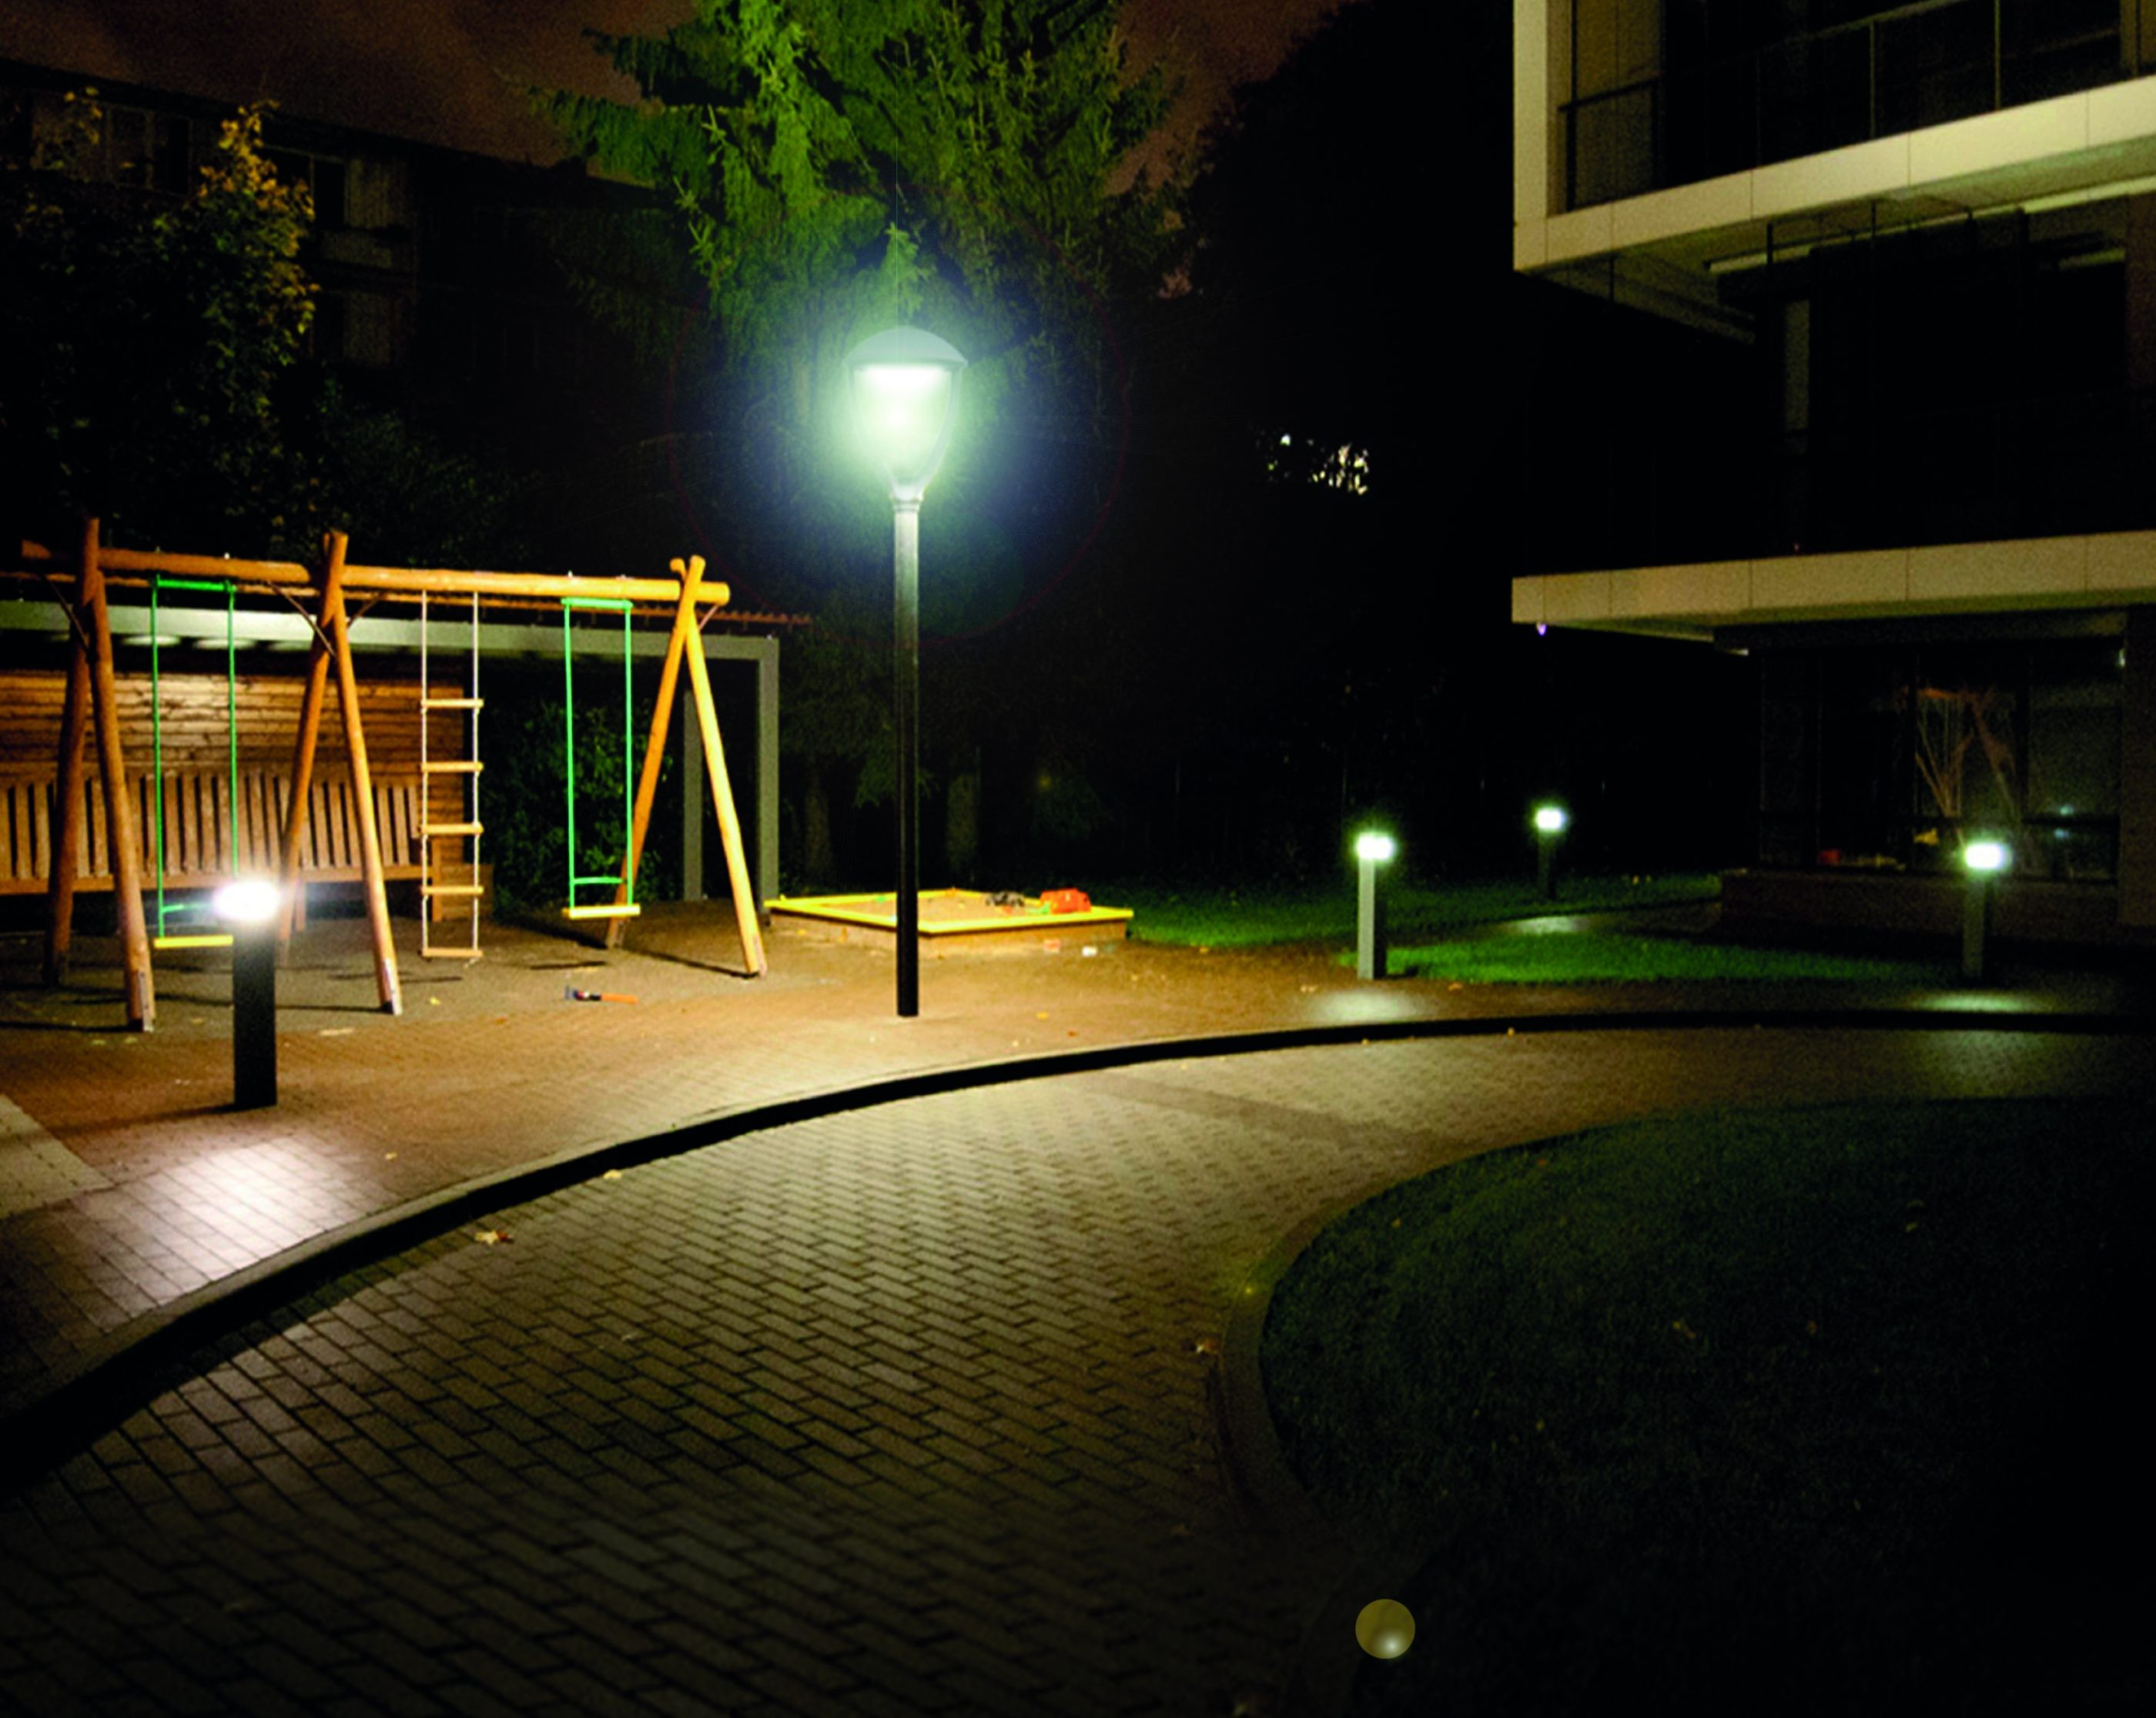 iluminacion jardines leds para lucido luminaria de parques y plazas led 90w dibujo para iluminacion jardines leds